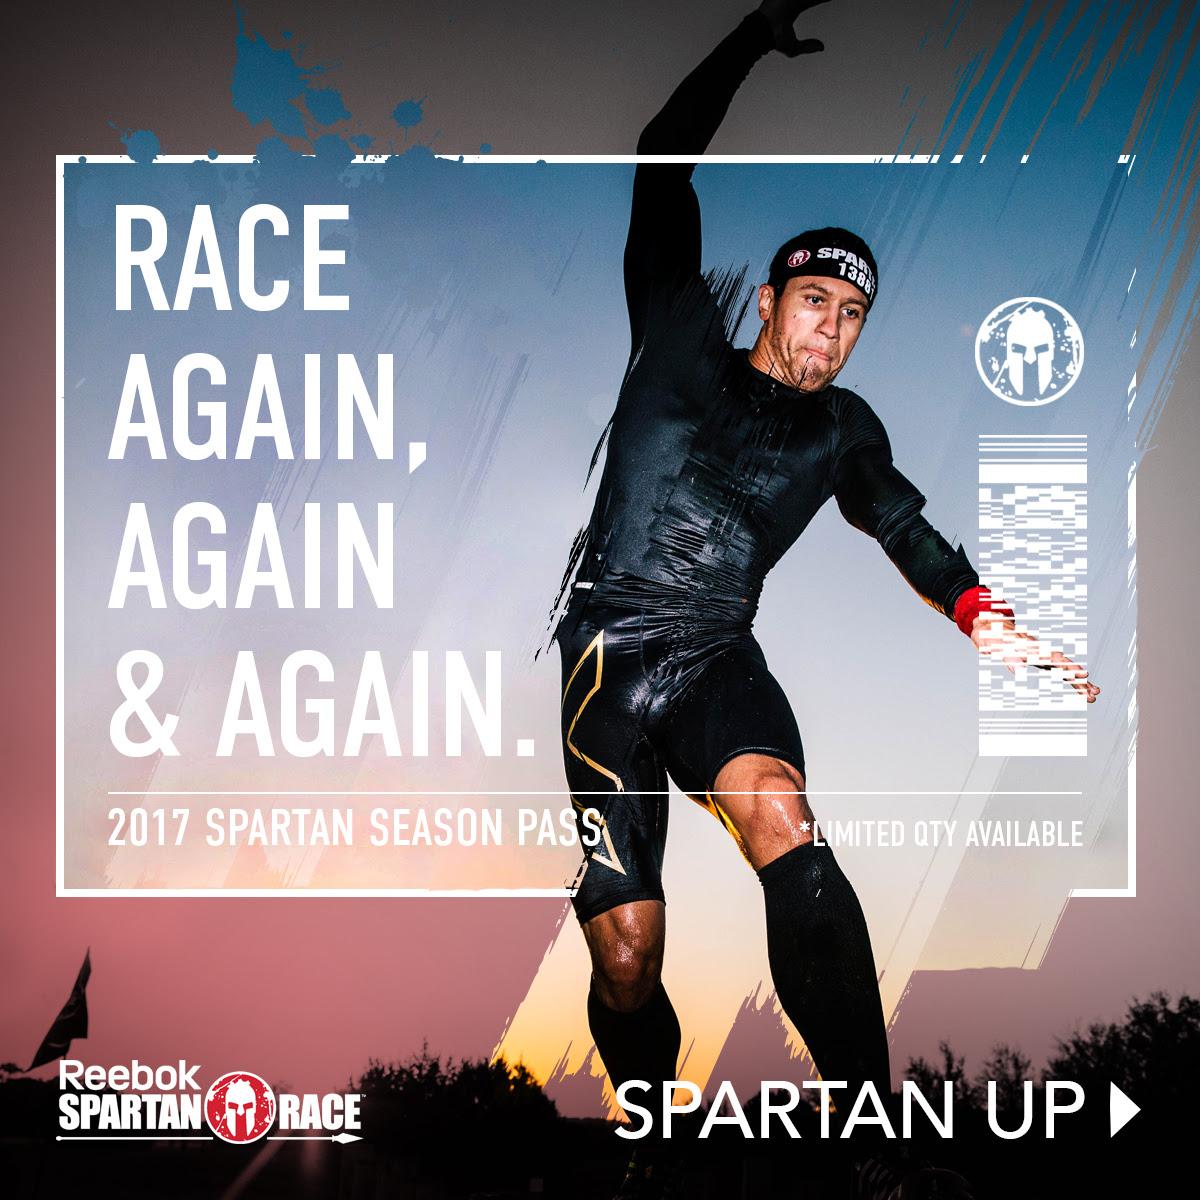 SPARTAN RACE Season Pass on sale now!